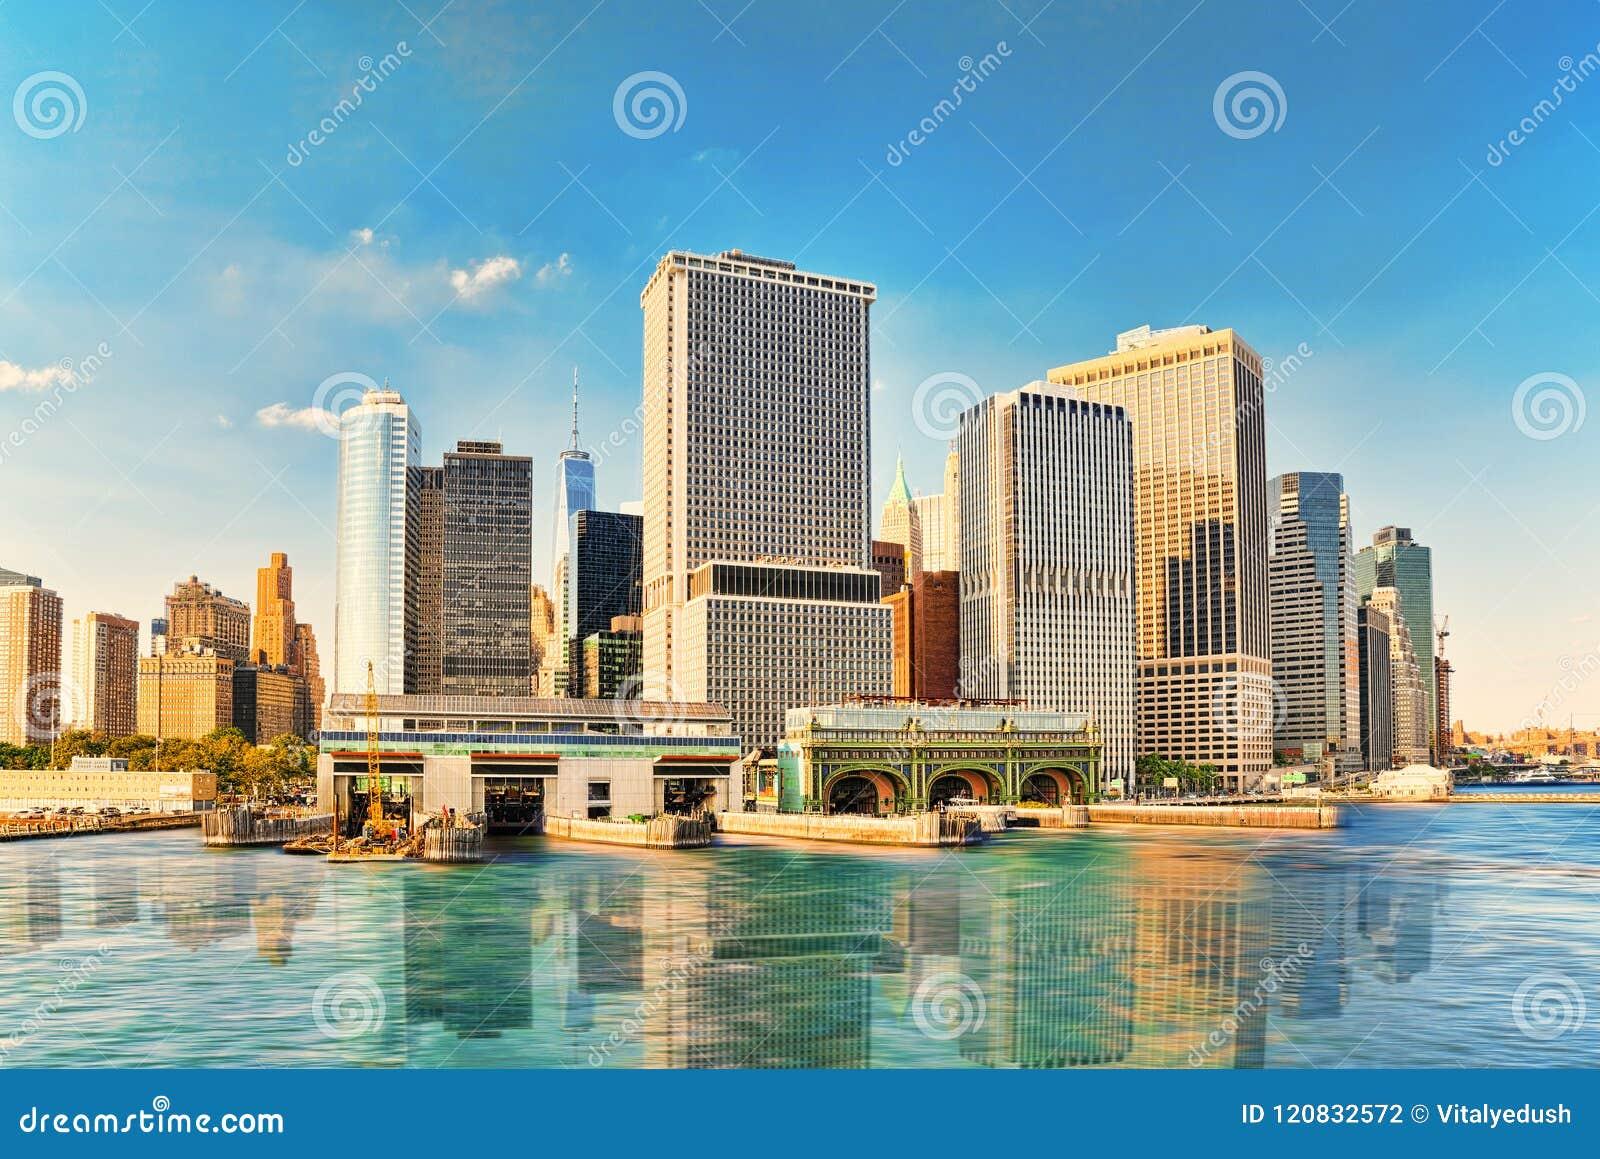 De baai van meningshudson aan Lower Manhattan en Staten Island Ferry-termi